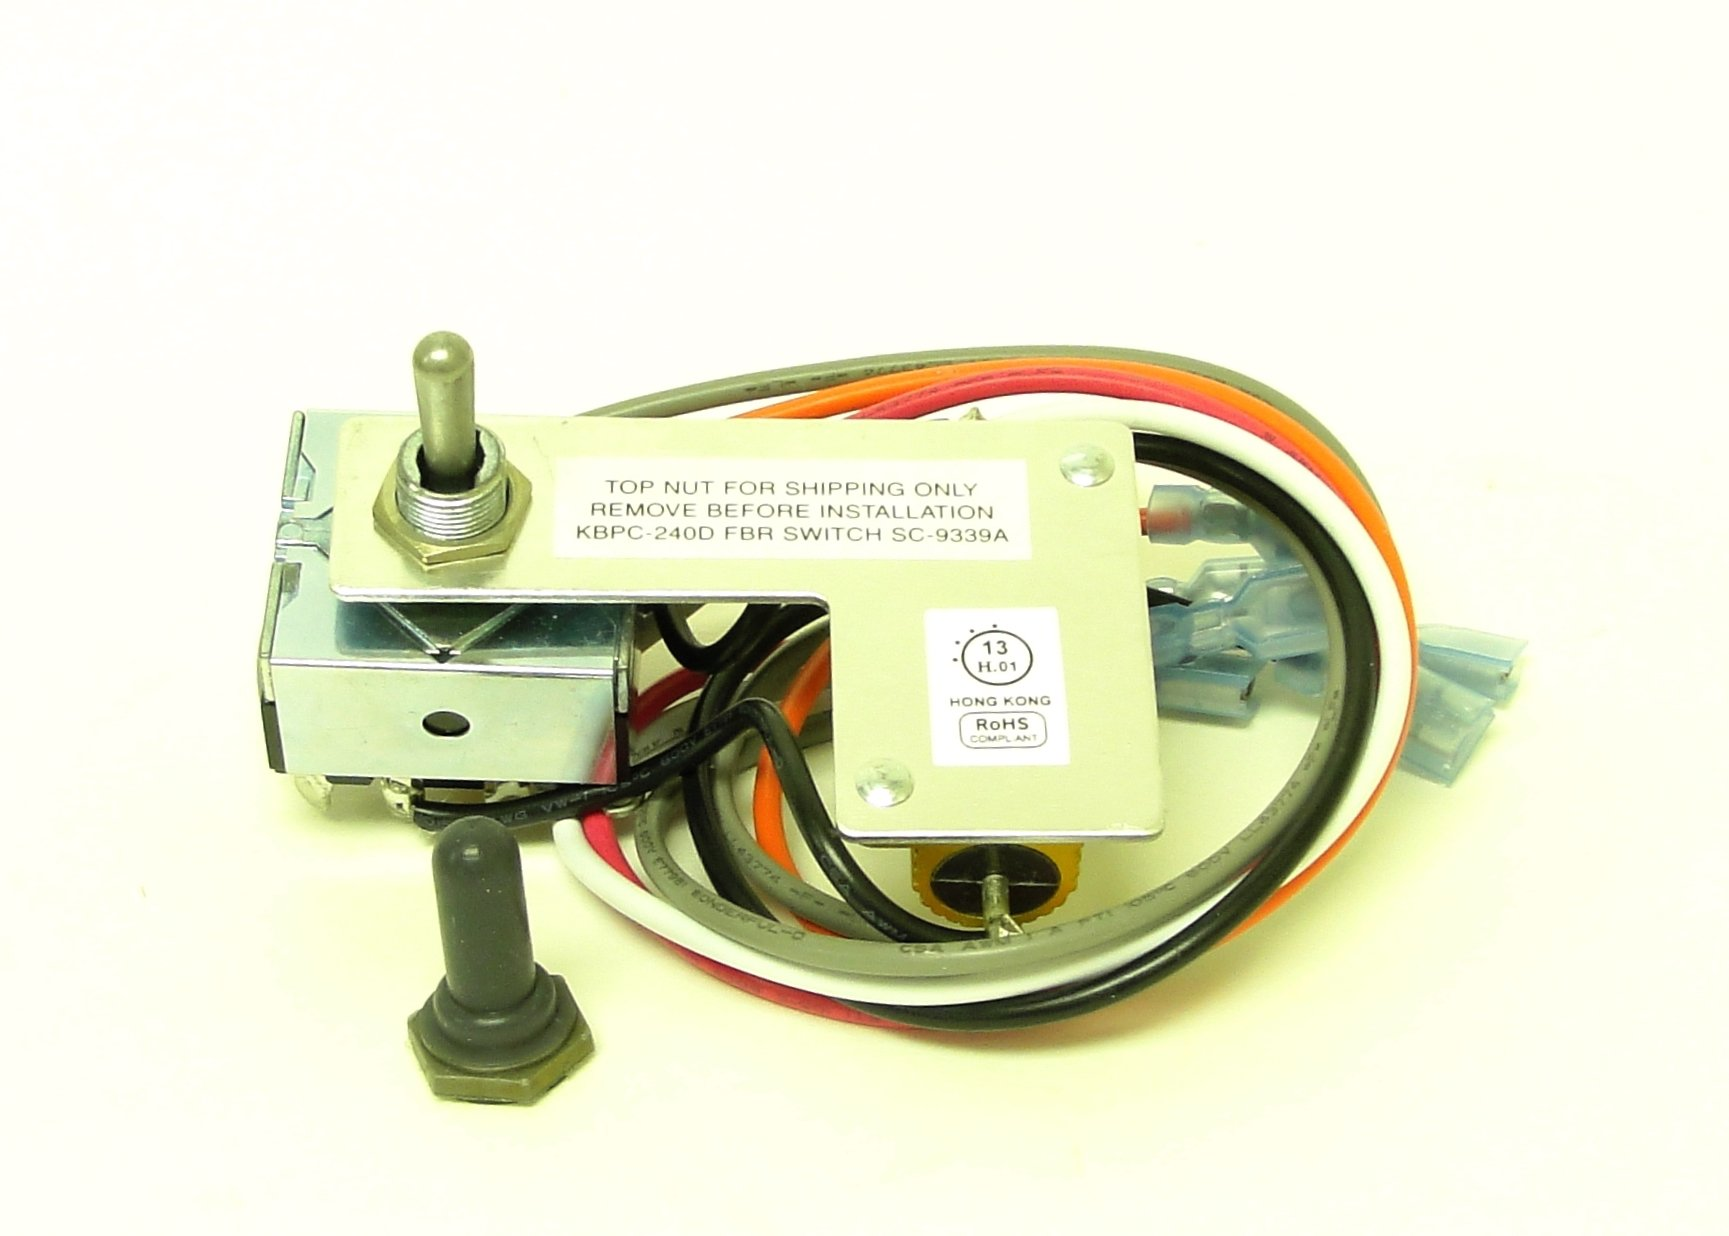 KB Electronics Forward-Brake-Reverse Switch 9339 for KBPC-240D upc 02482200052 by KB Electronics